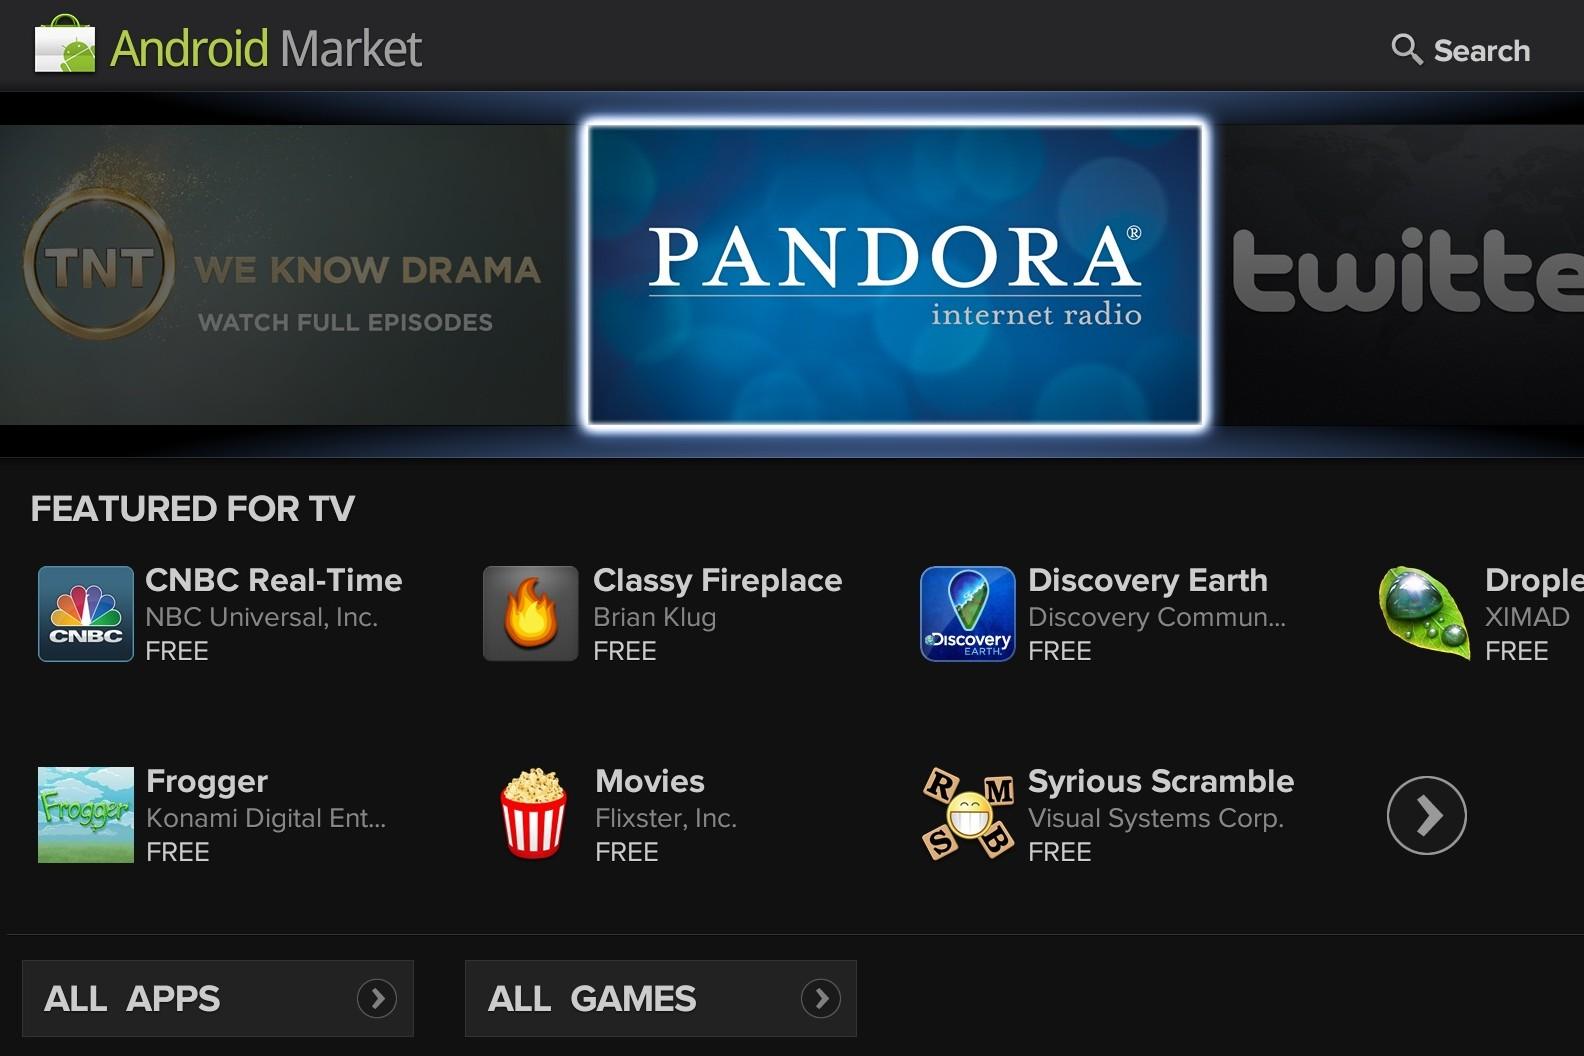 AndroidMarketGTV